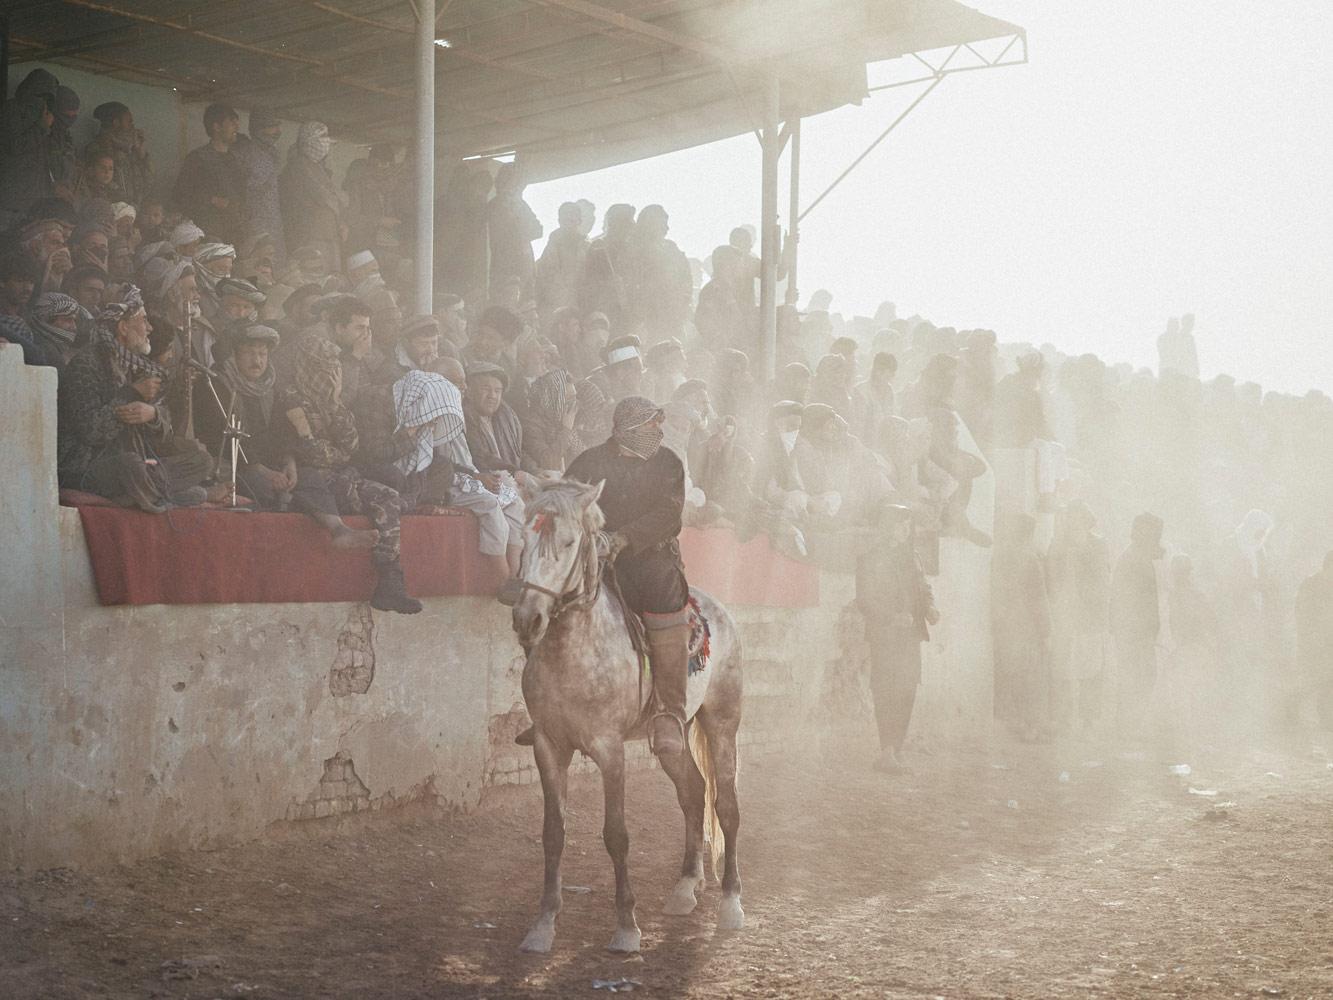 Бузкаши, © Балаж Гарди, 1 место, категория «Спорт», профессионал, Sony World Photography Awards 2018